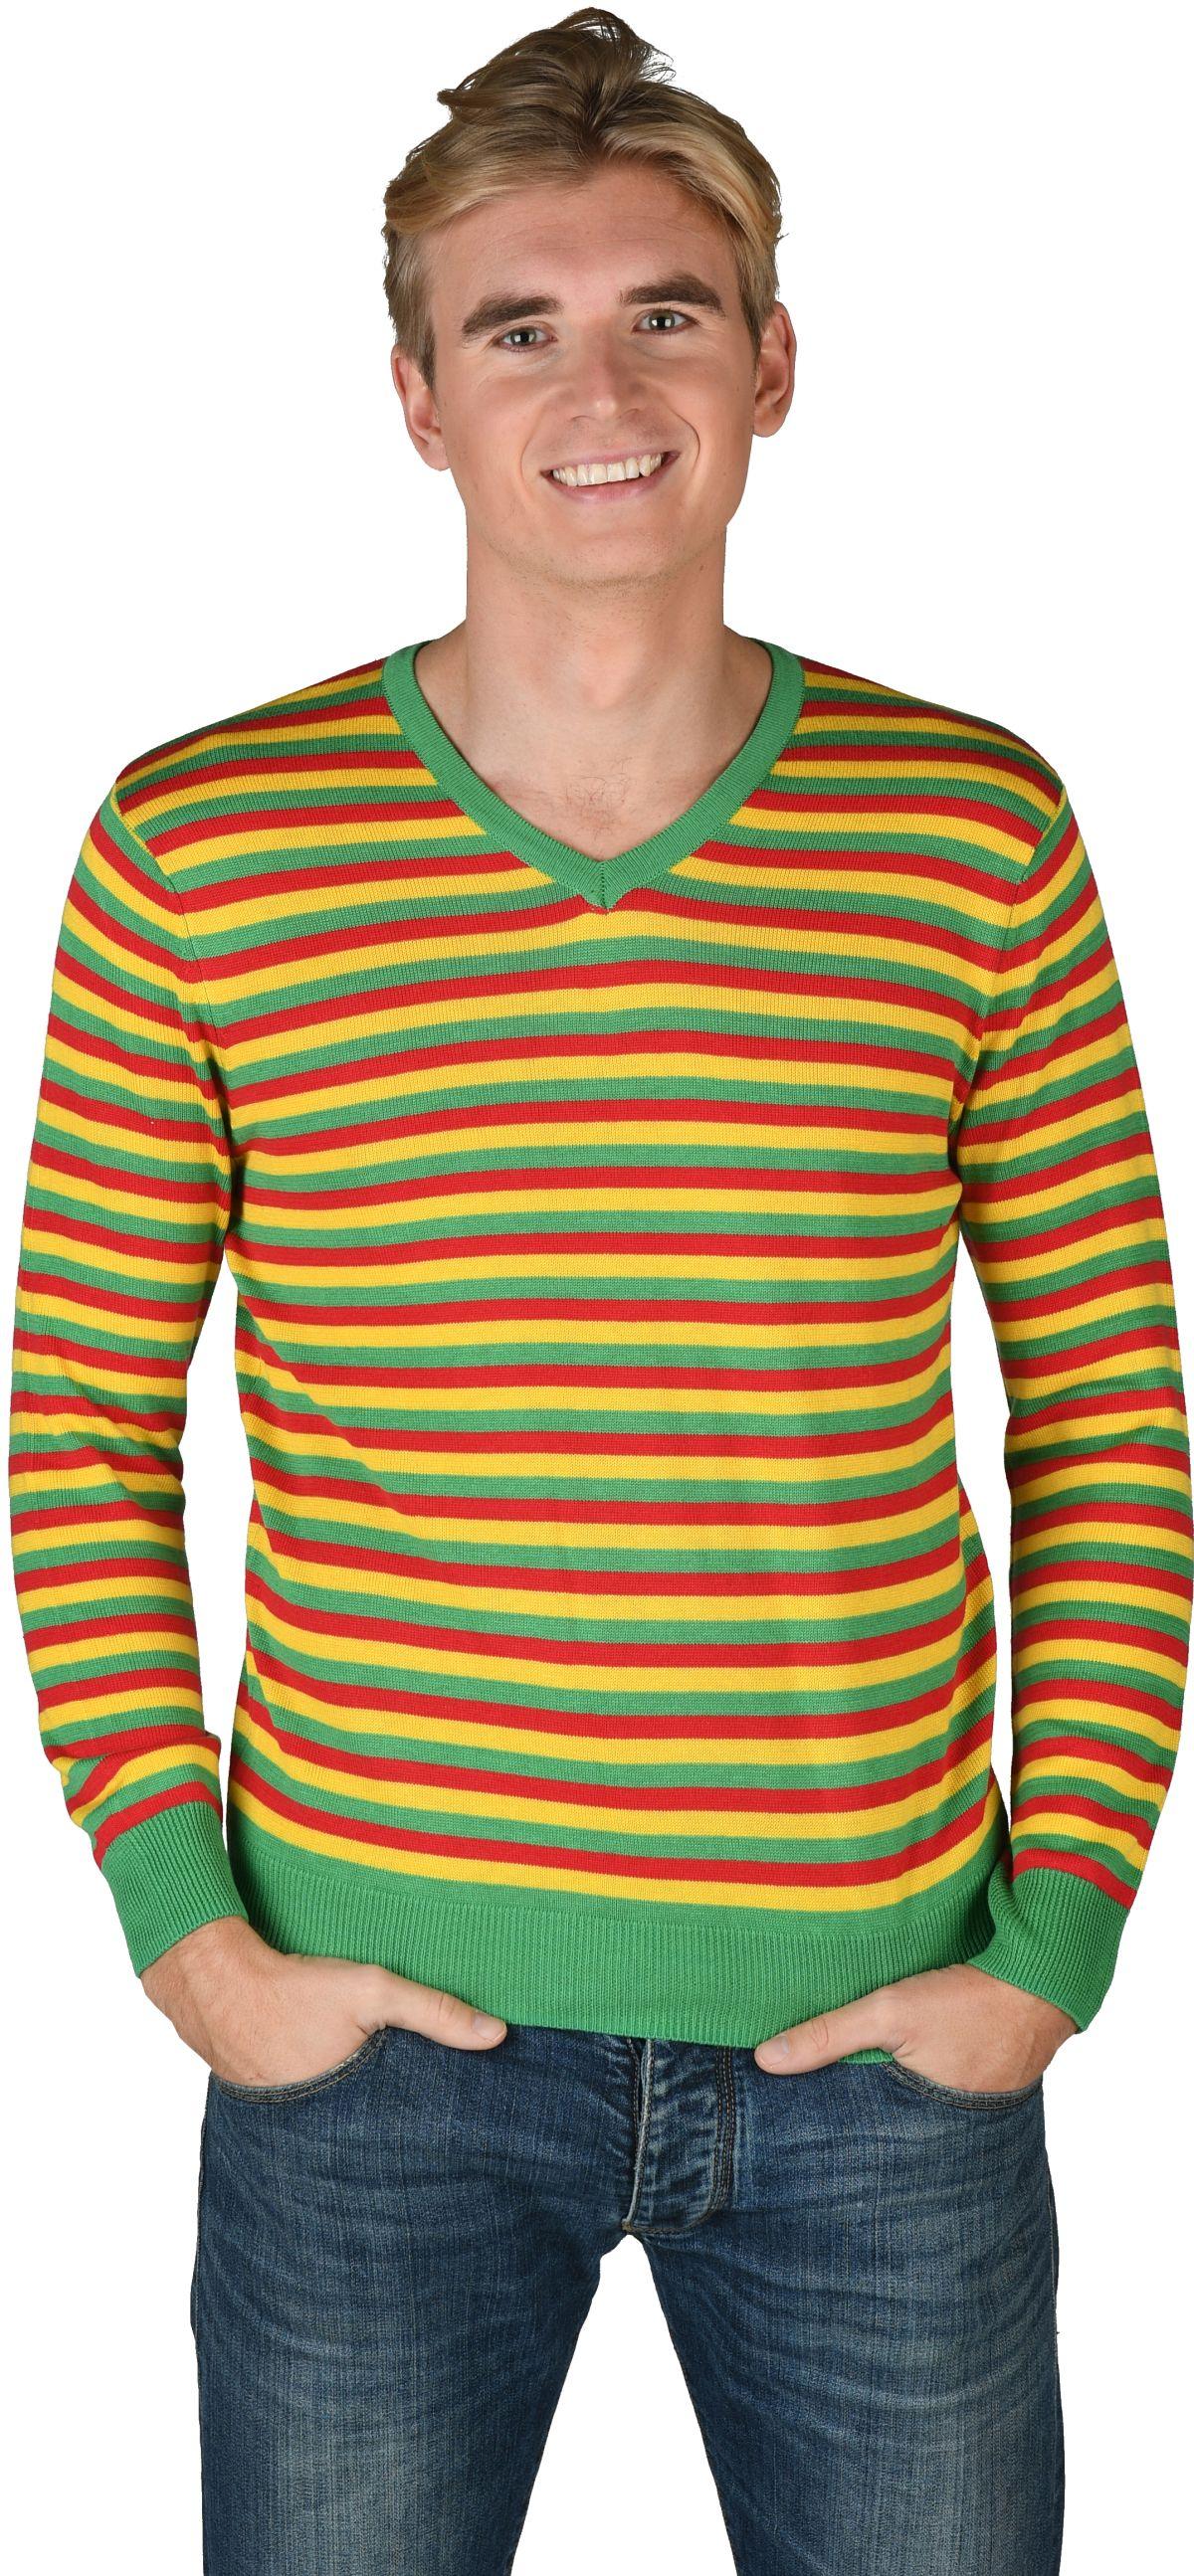 Striped sweater redyellowgreen